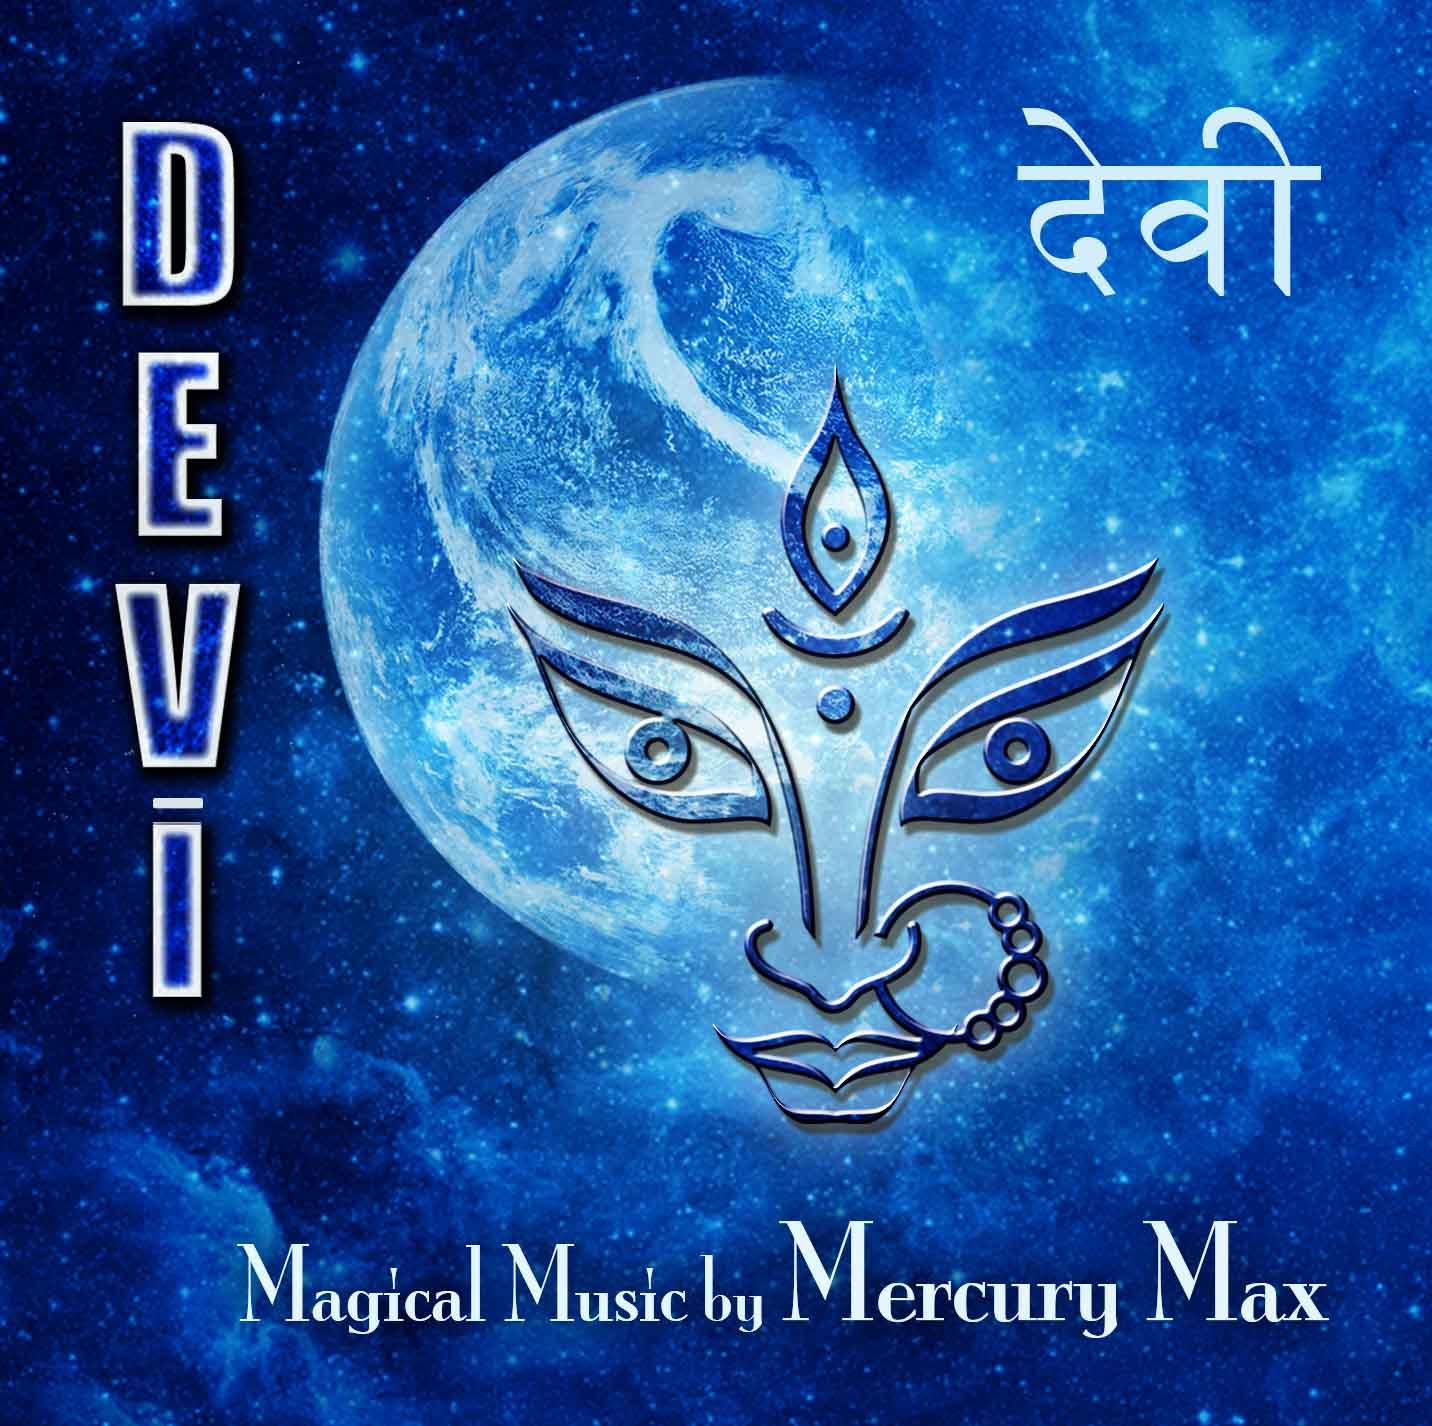 Devi CD by Mercury Max